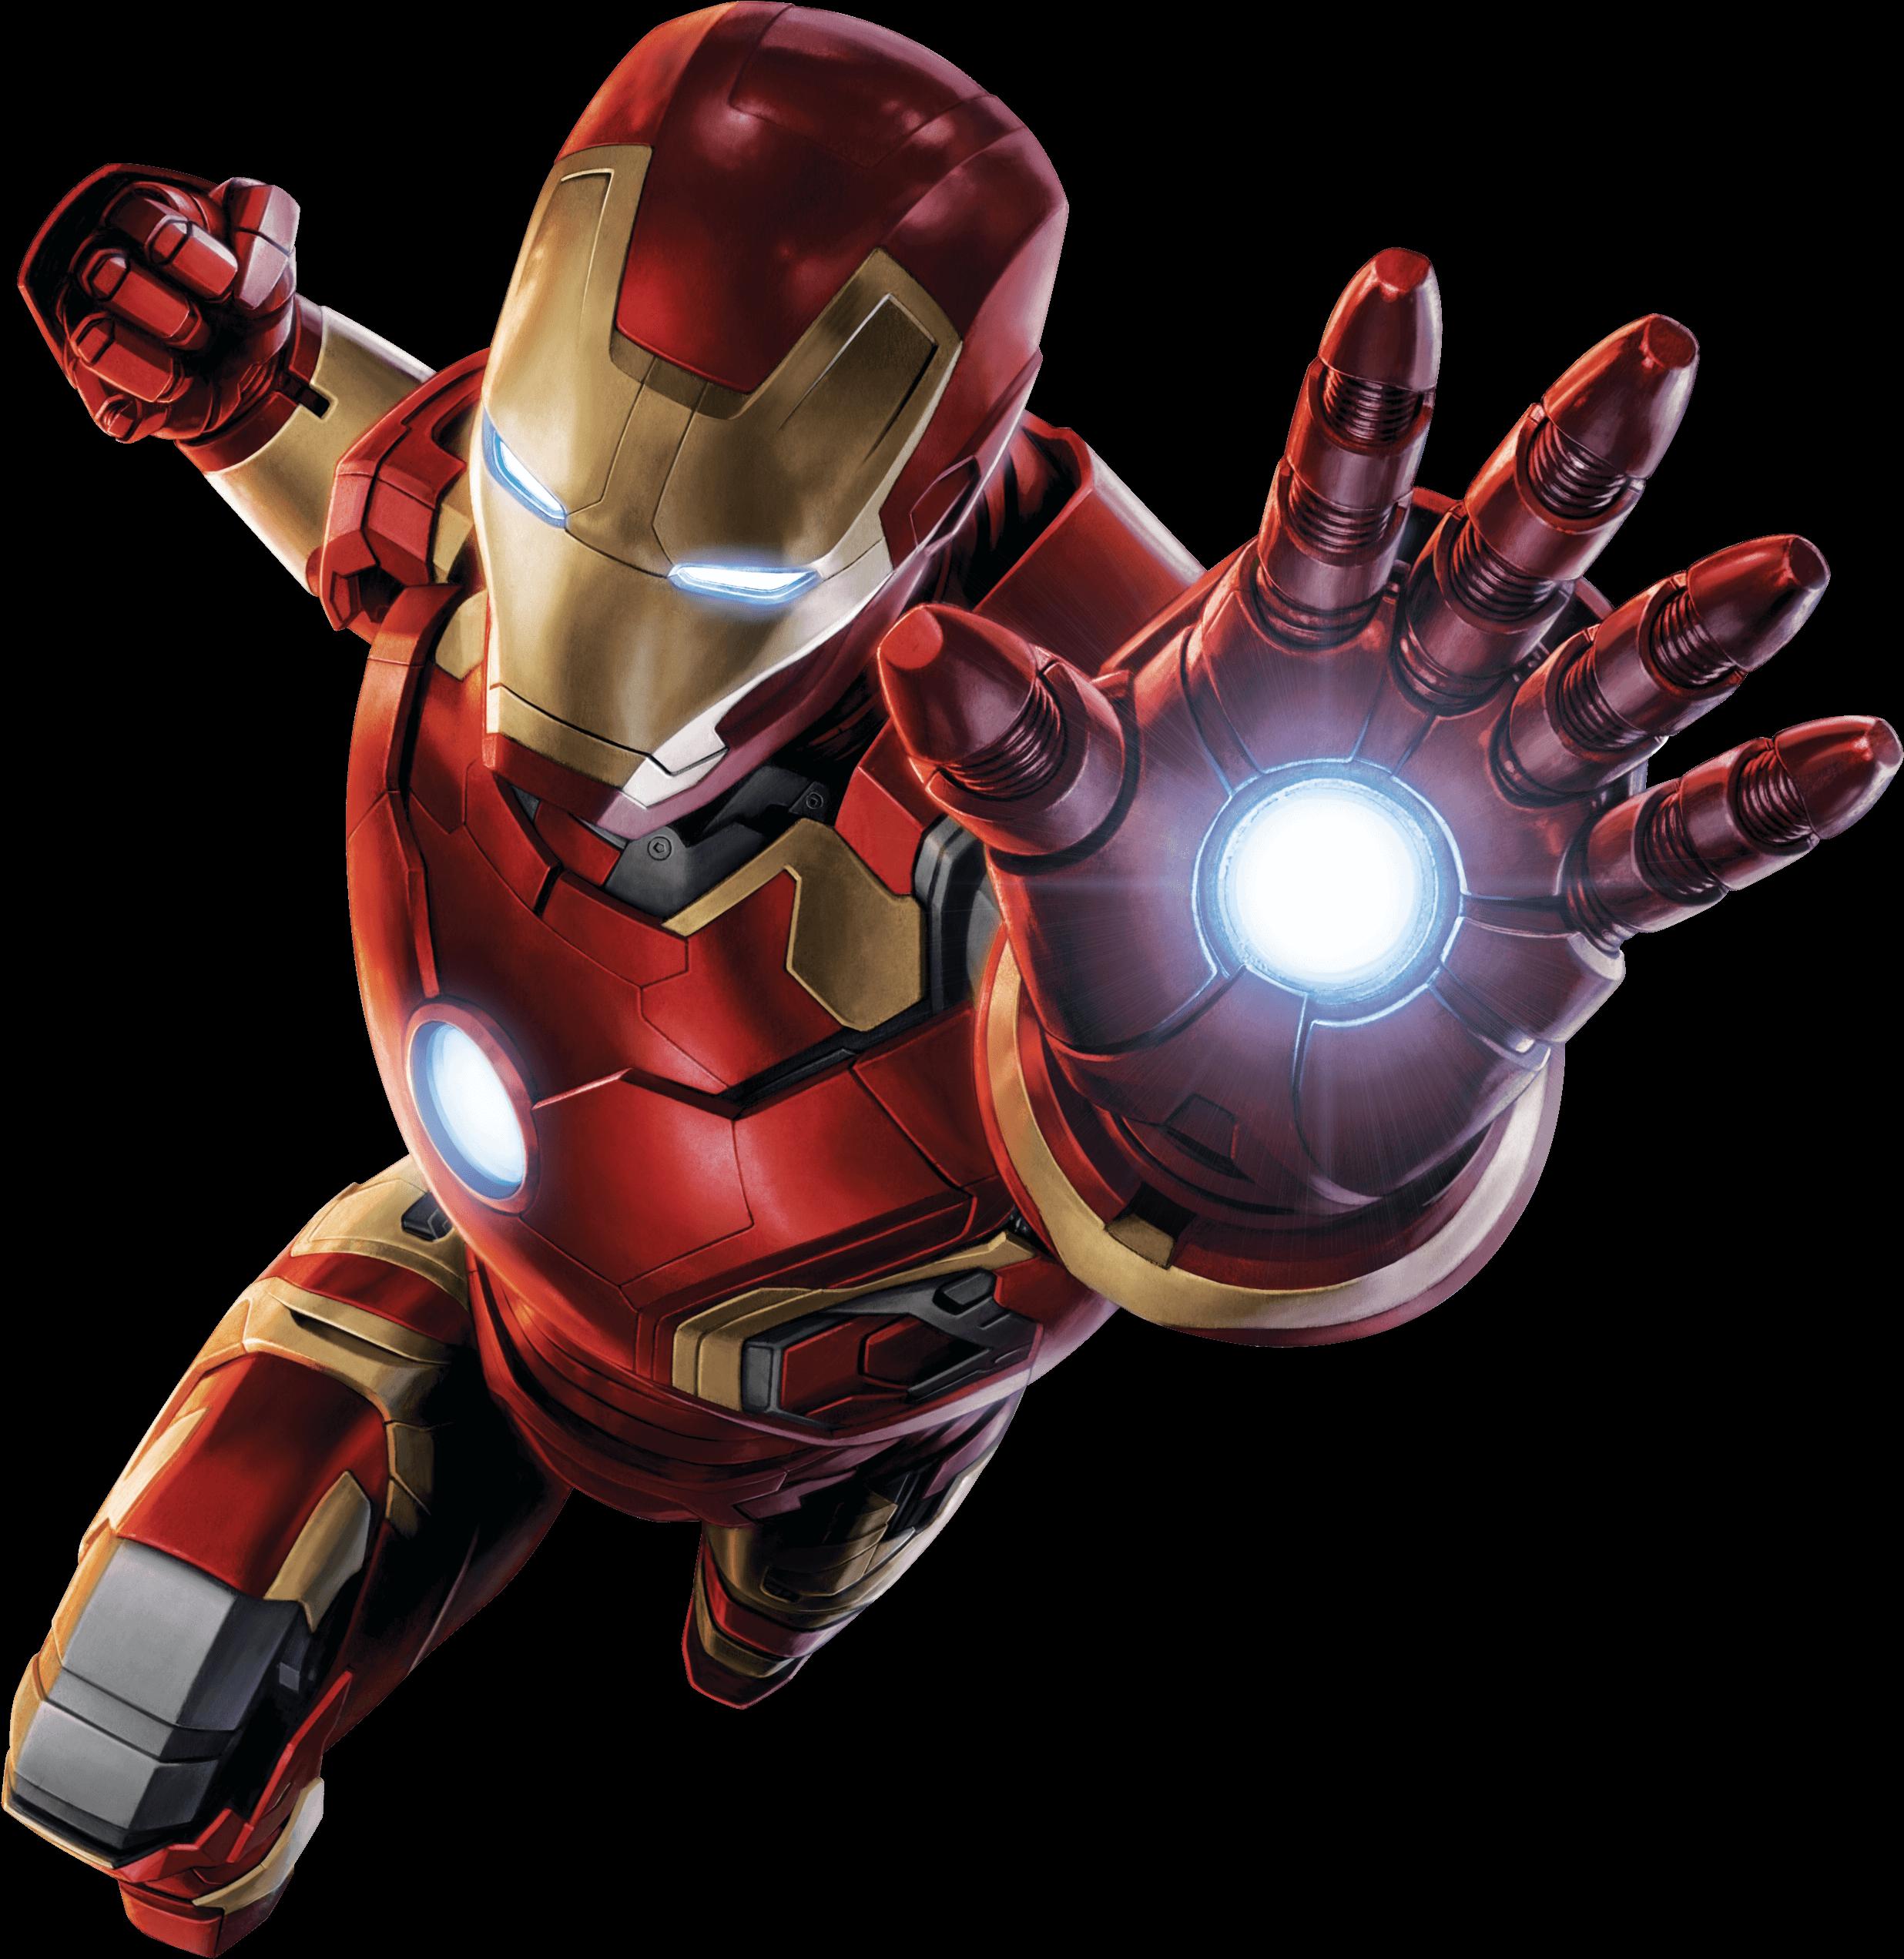 Ironman Tonystark Marvel Avengers Robertdowneyjunior ...